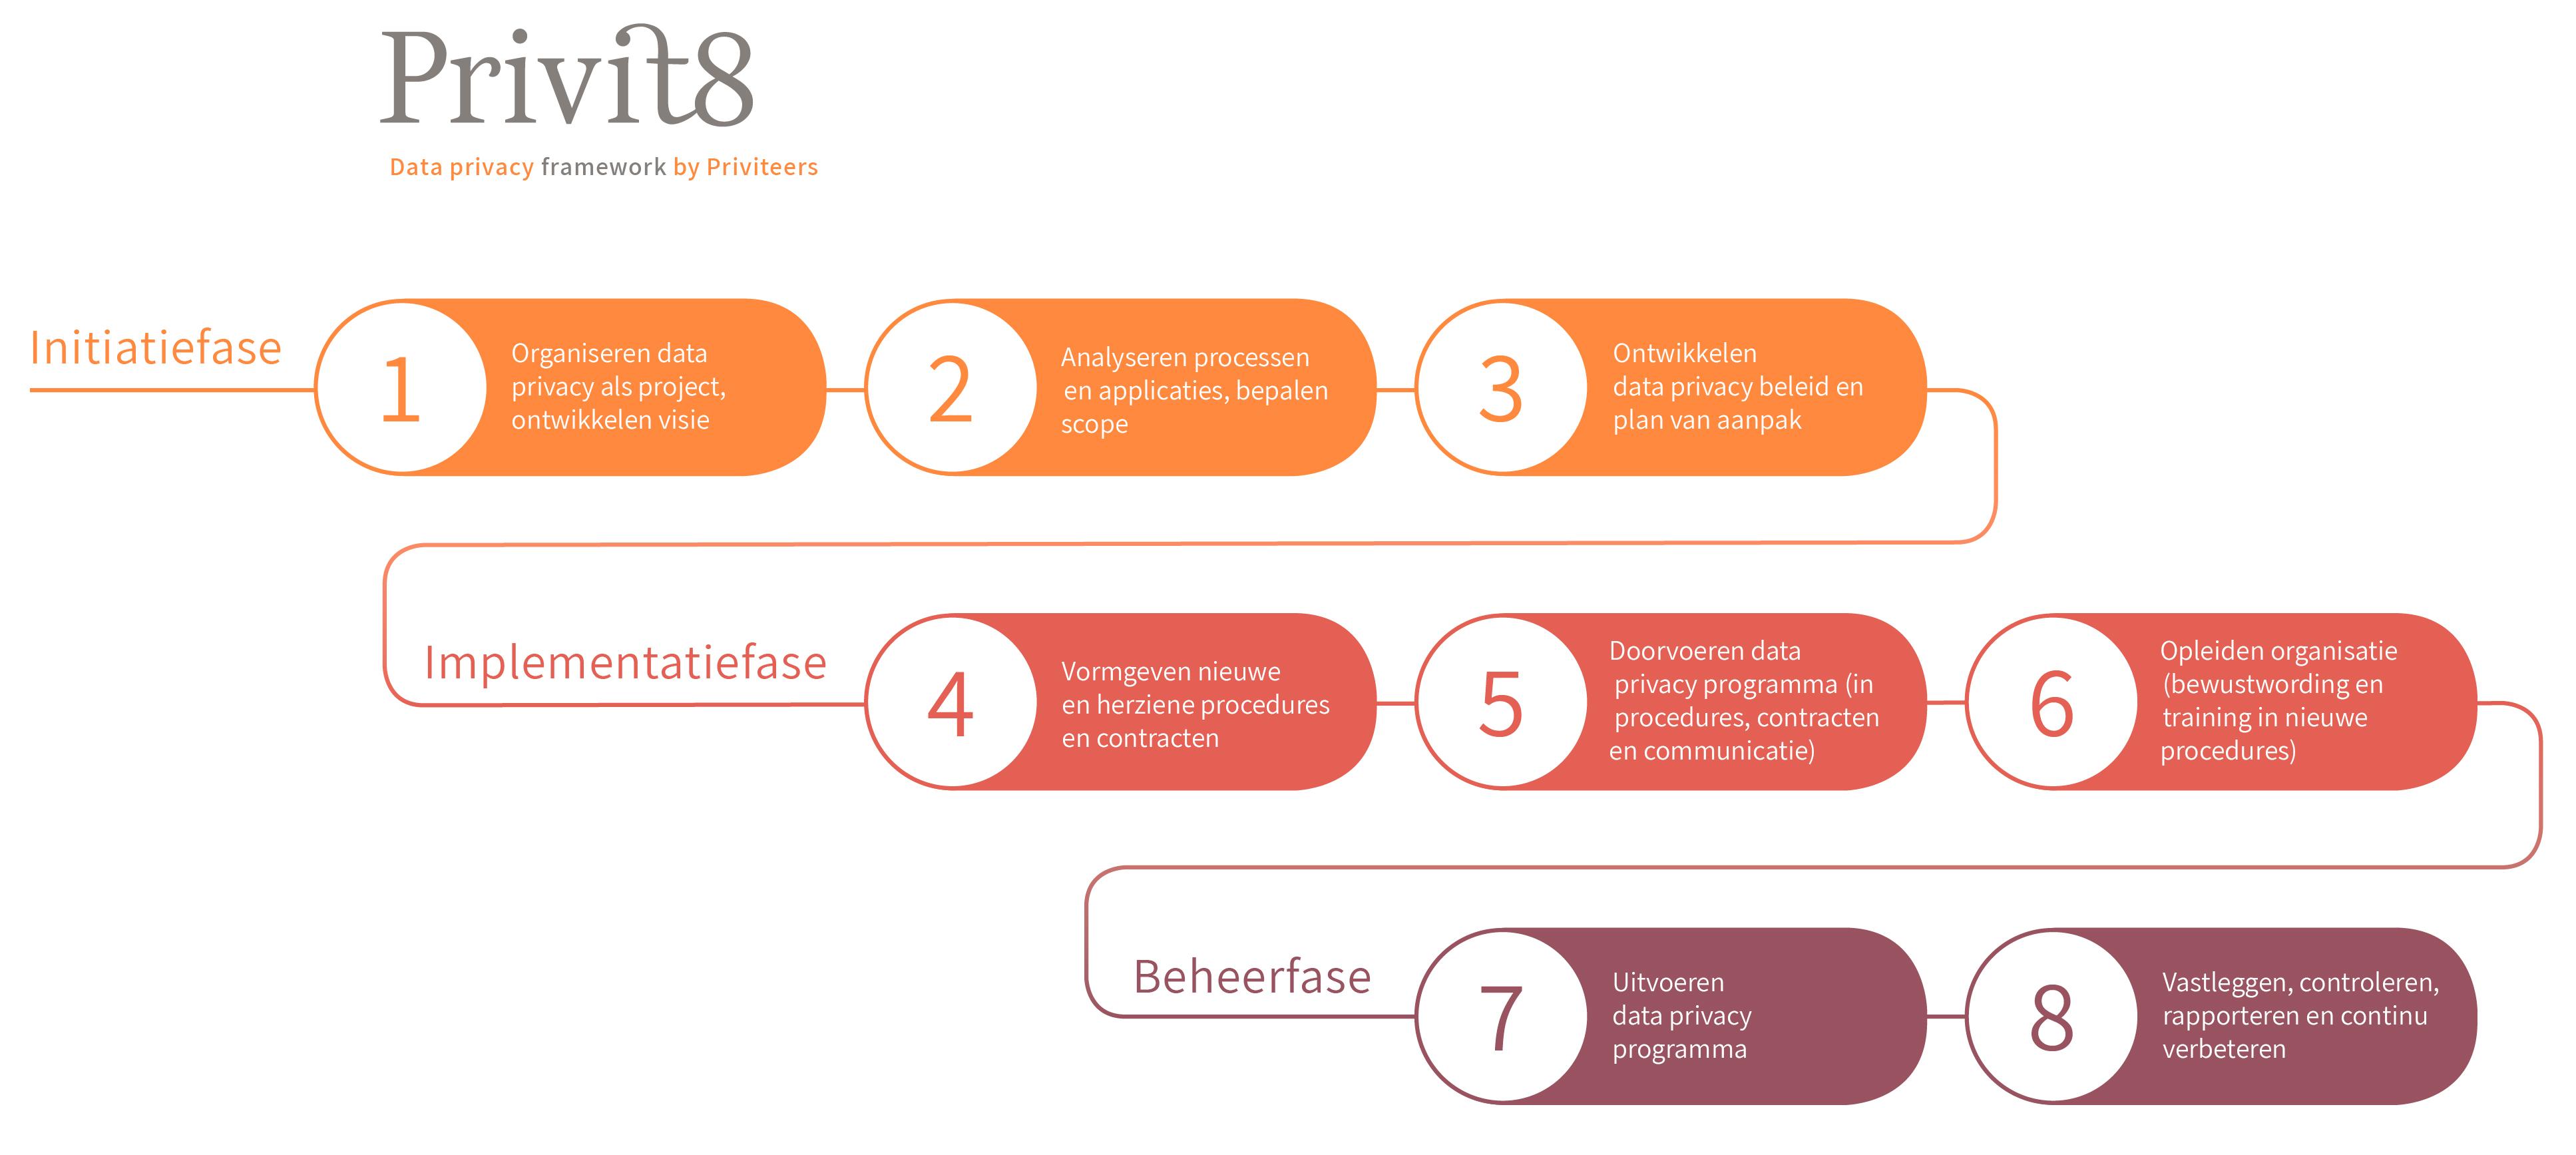 Privit8-framework-in-kleur